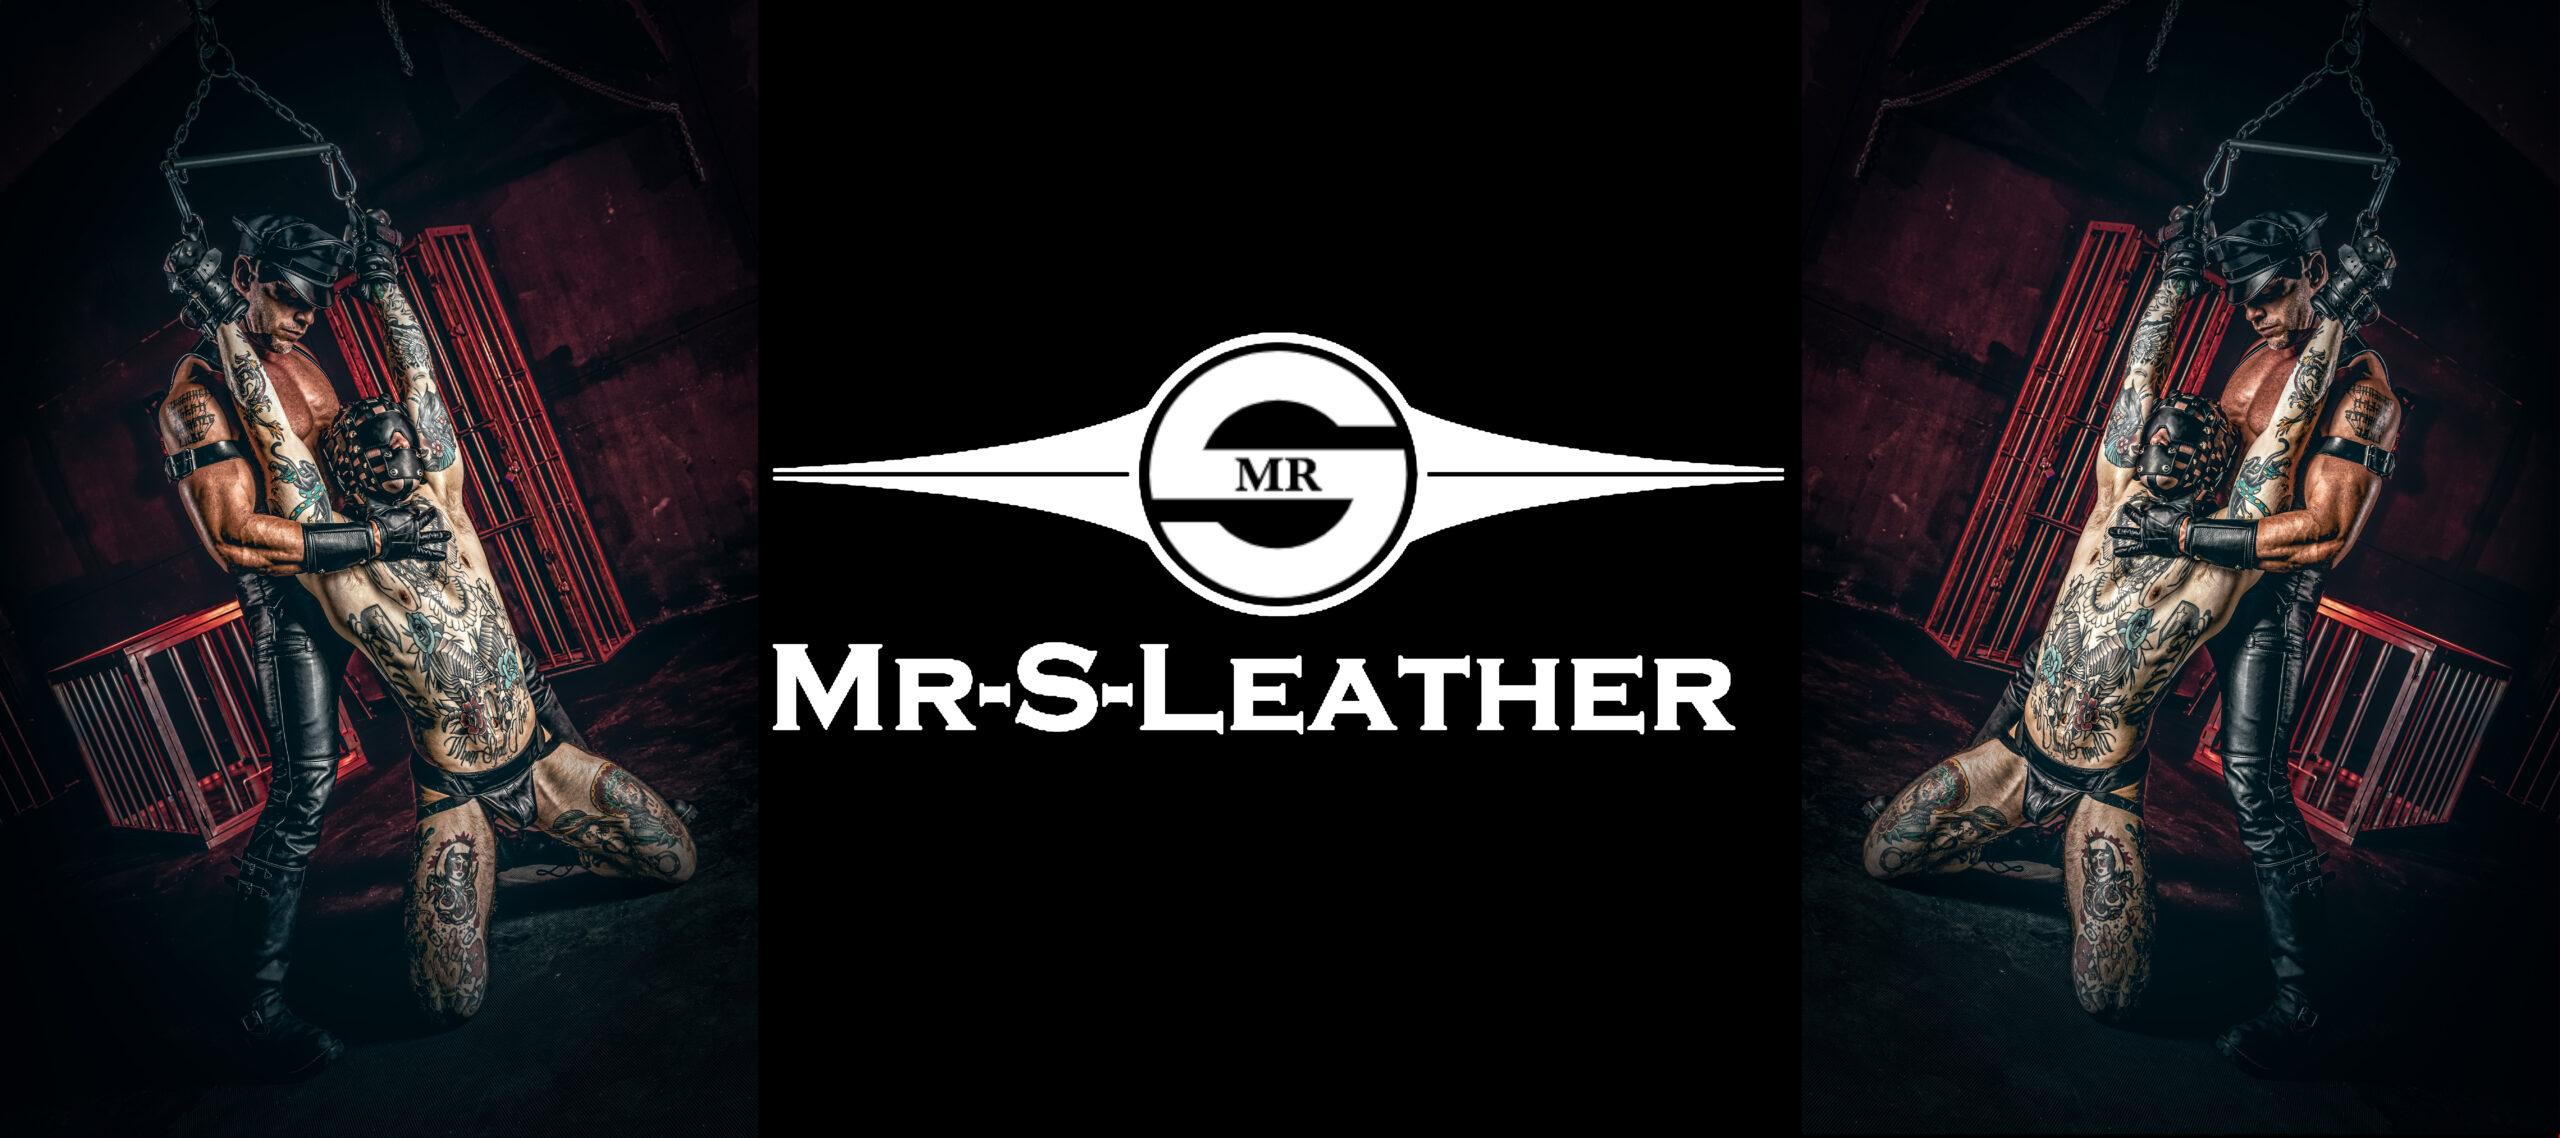 2 Mr s banner